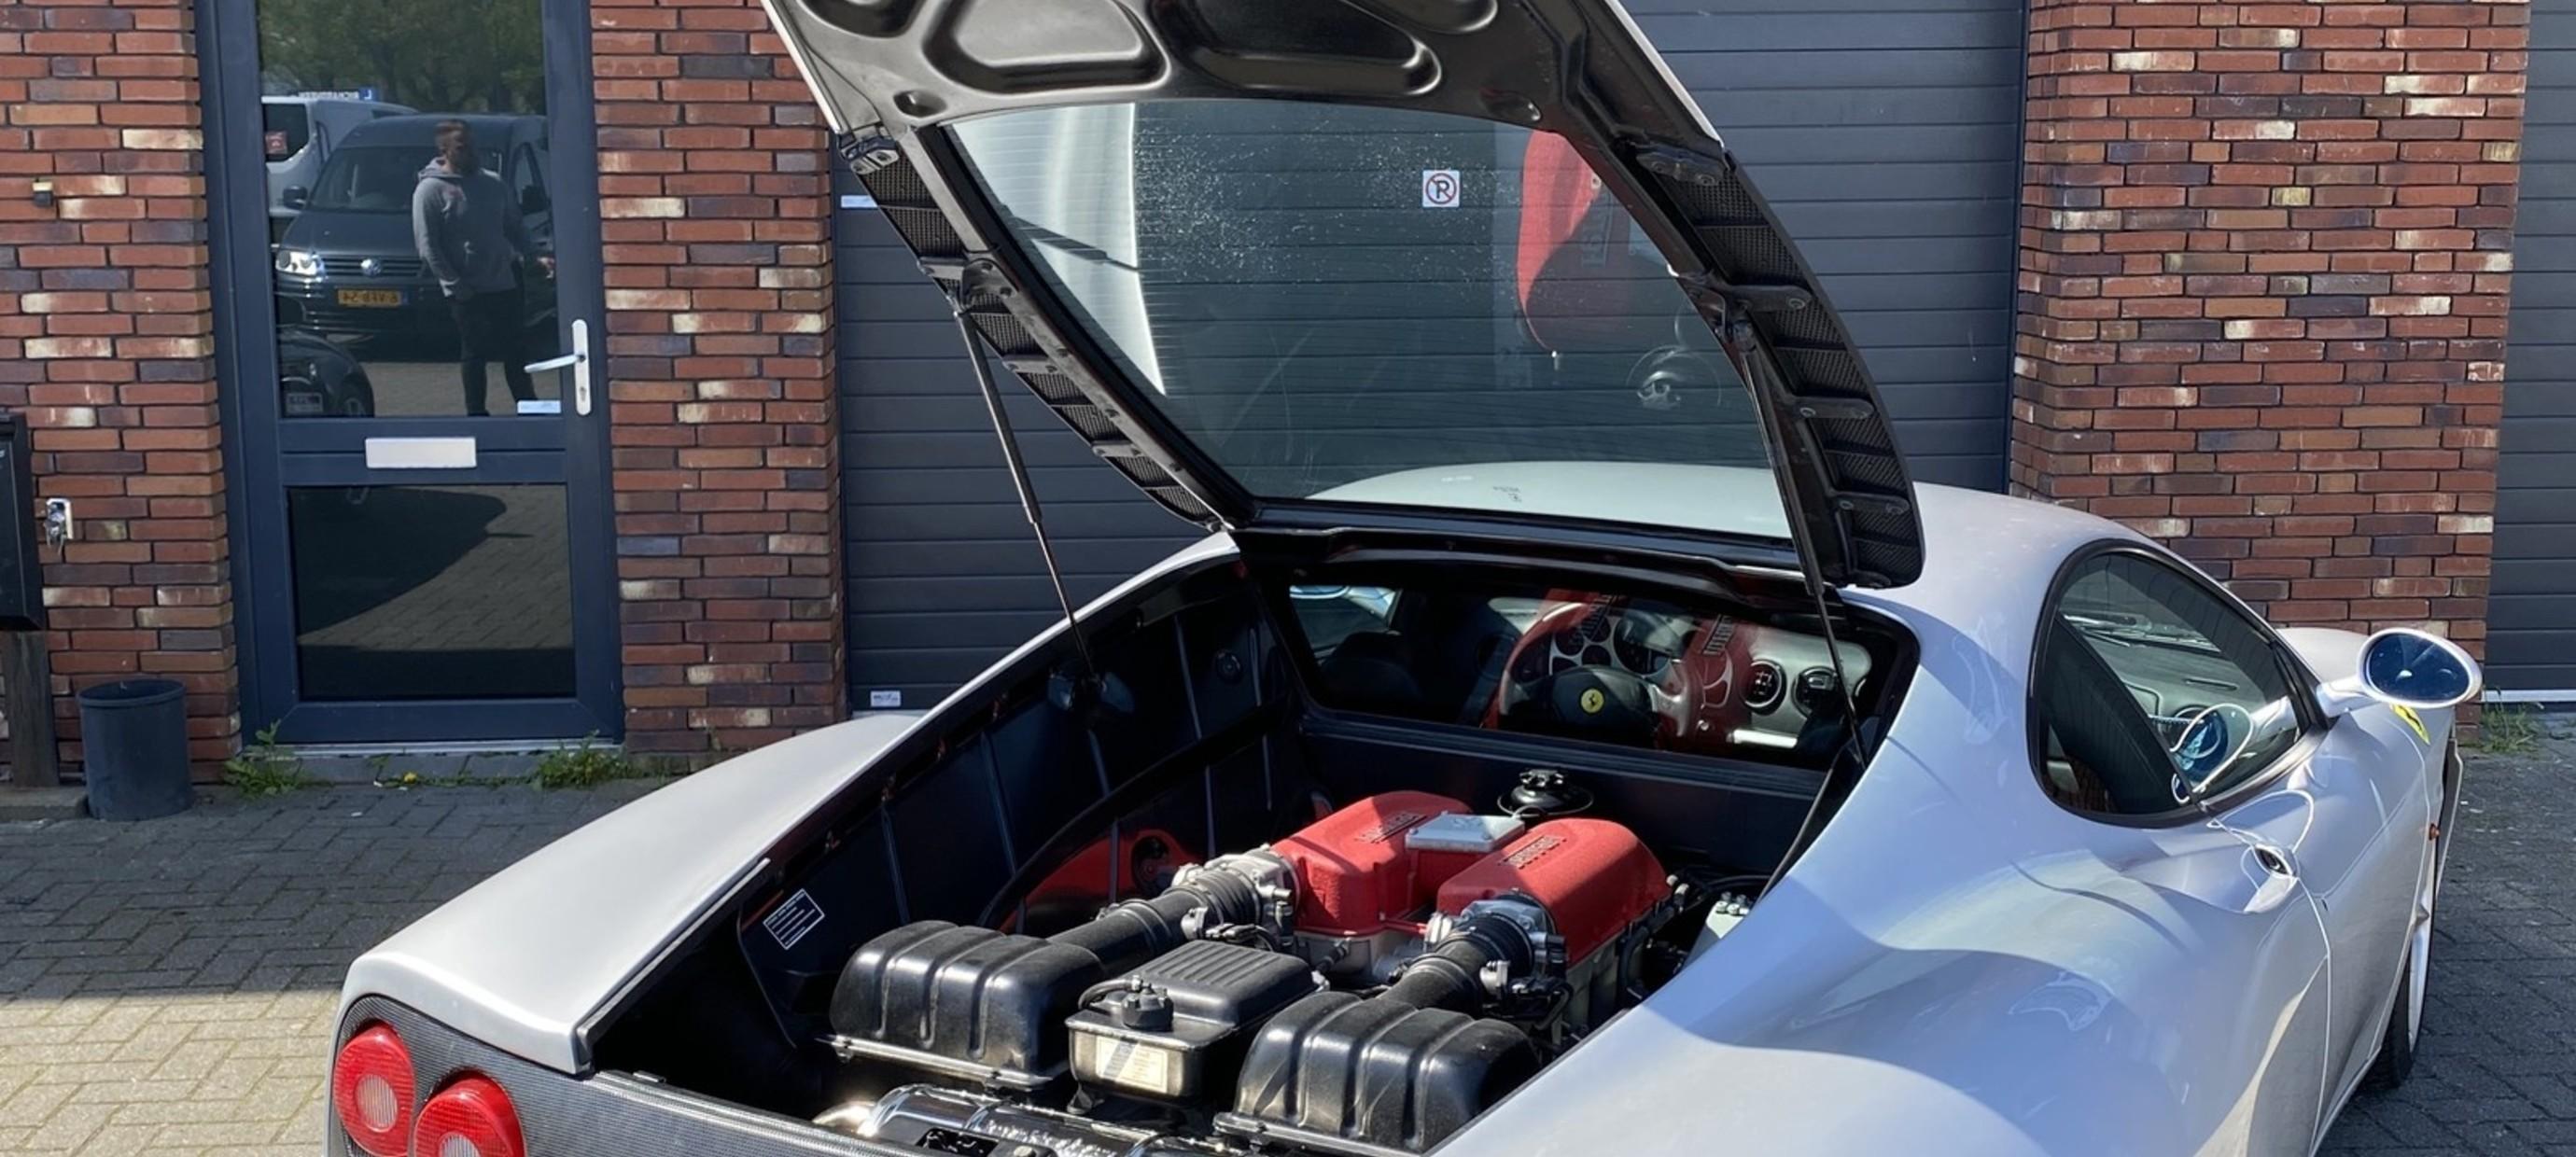 Ferrari 360 Modena Capristo exhaust